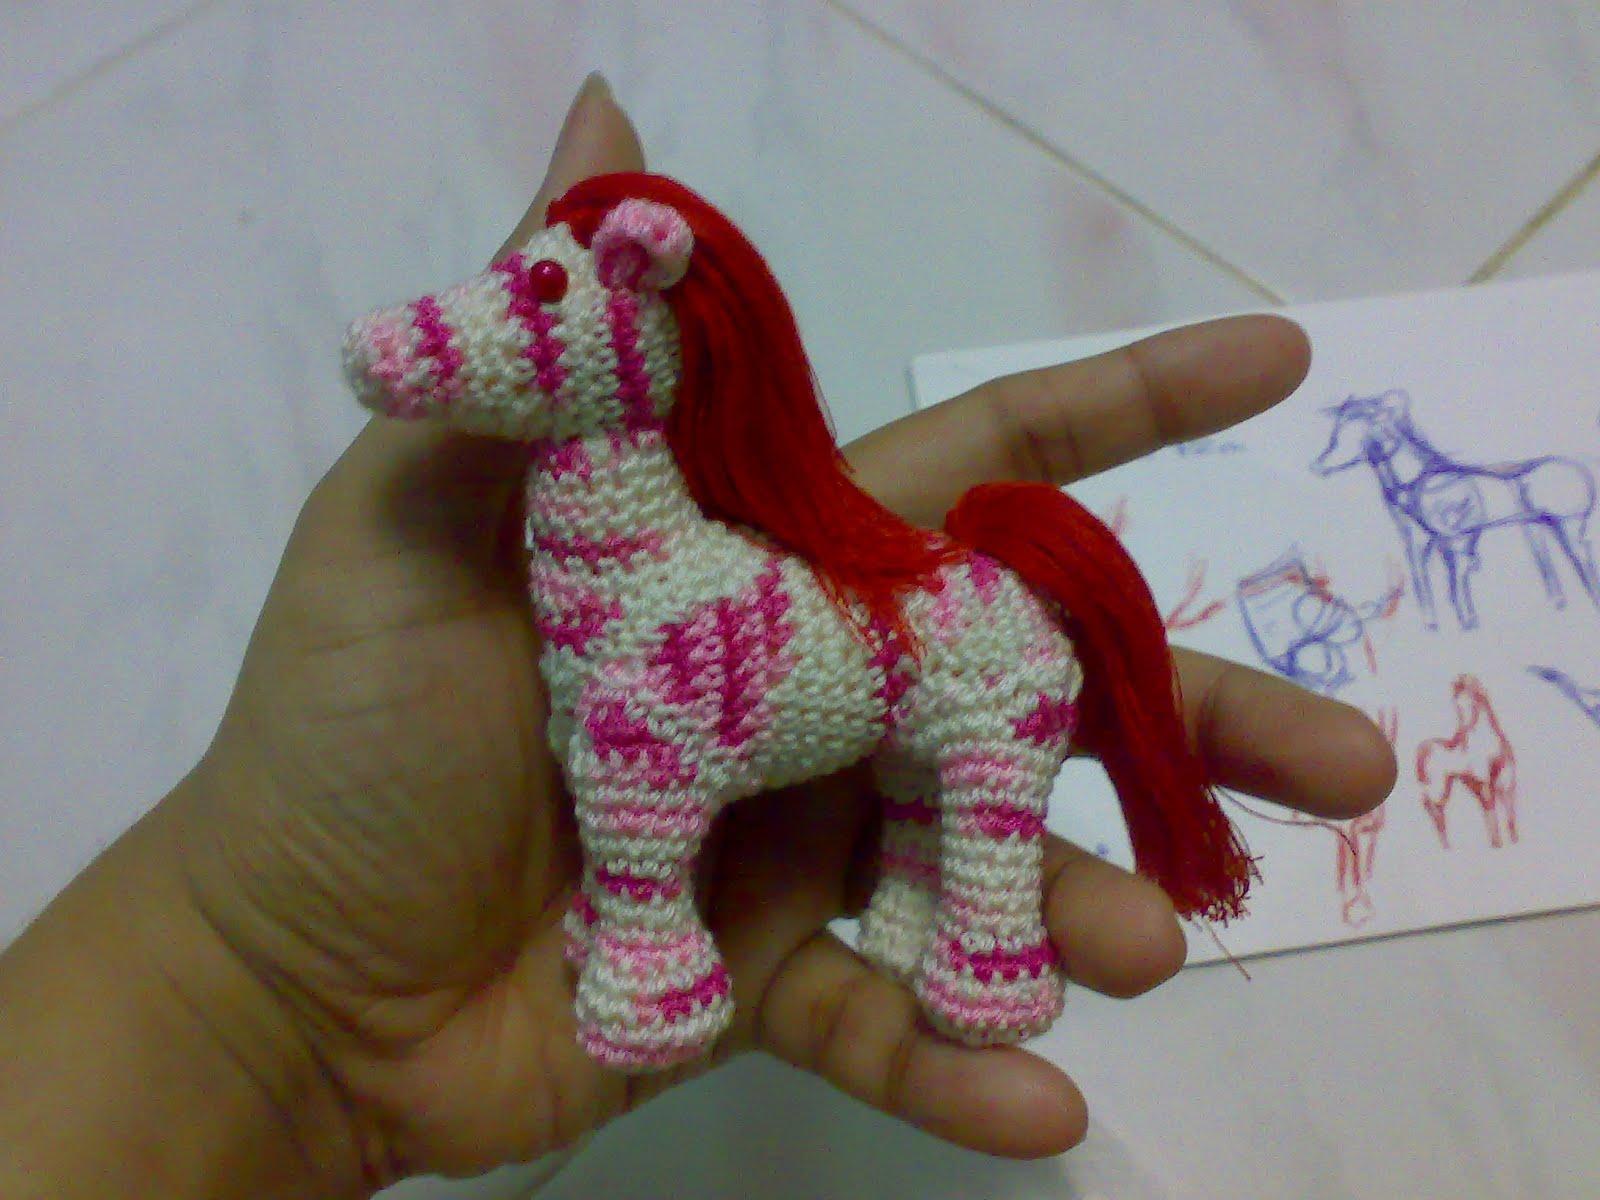 Abby The Horse Amigurumi Pattern | Stuff The Body | 1200x1600